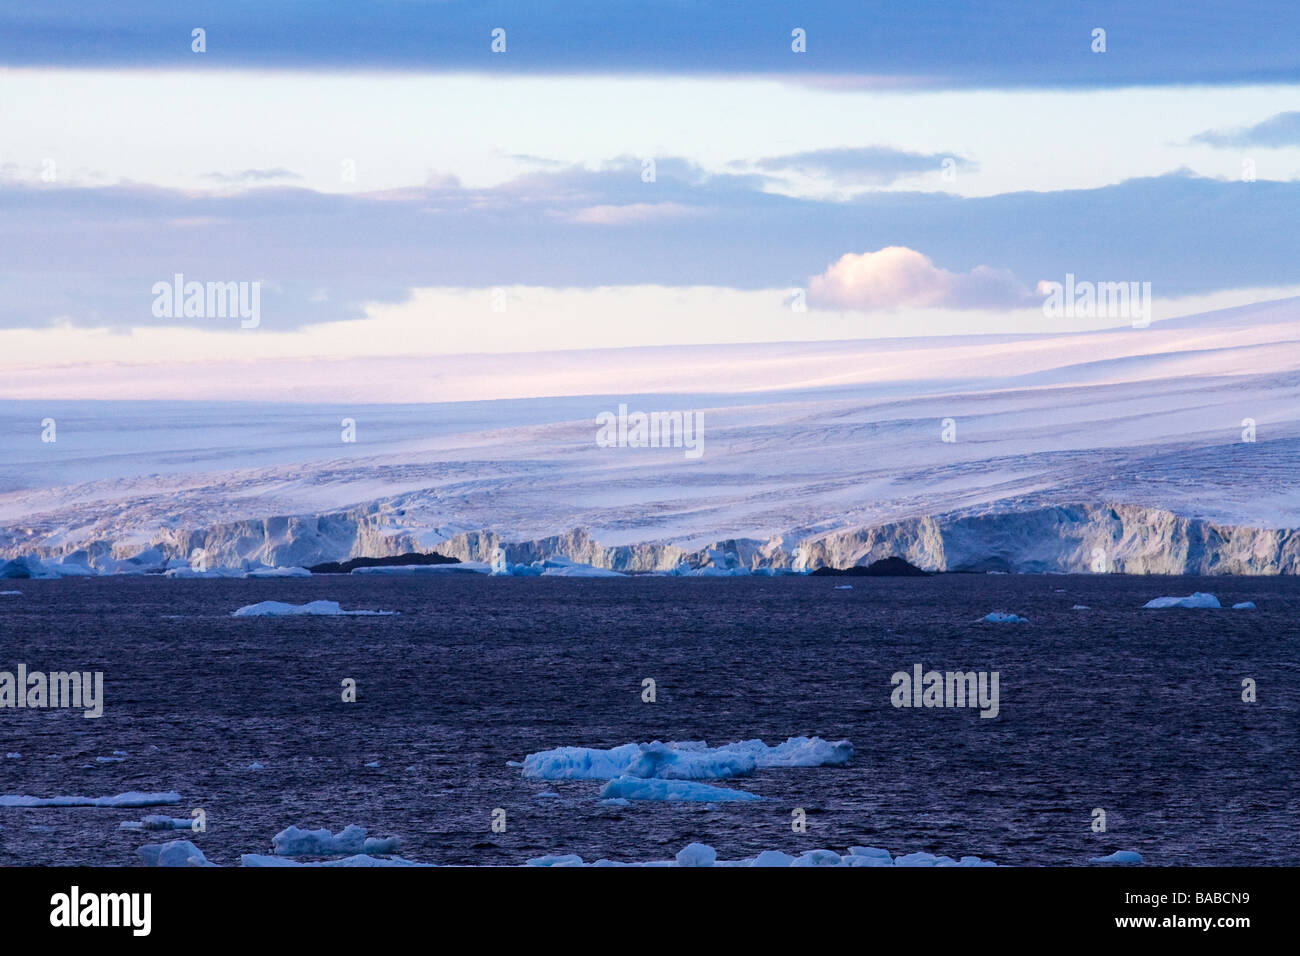 Glaciers meet the sea on the Antarctic Peninsula near Paulet Island Antarctica - Stock Image